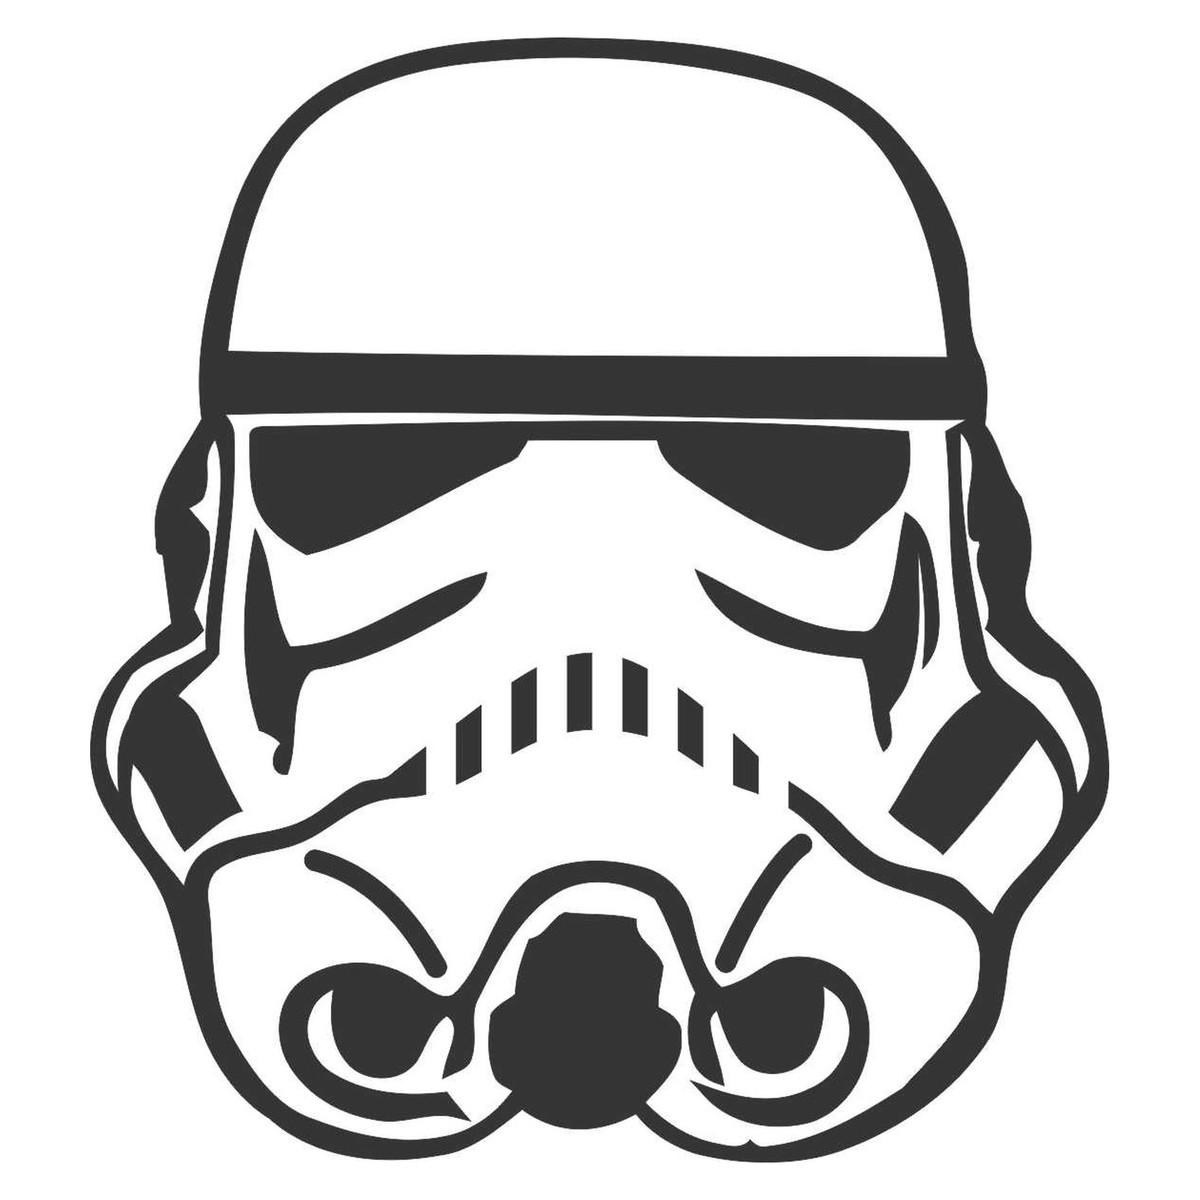 Adesivo Starwars Stormtrooper No Elo7